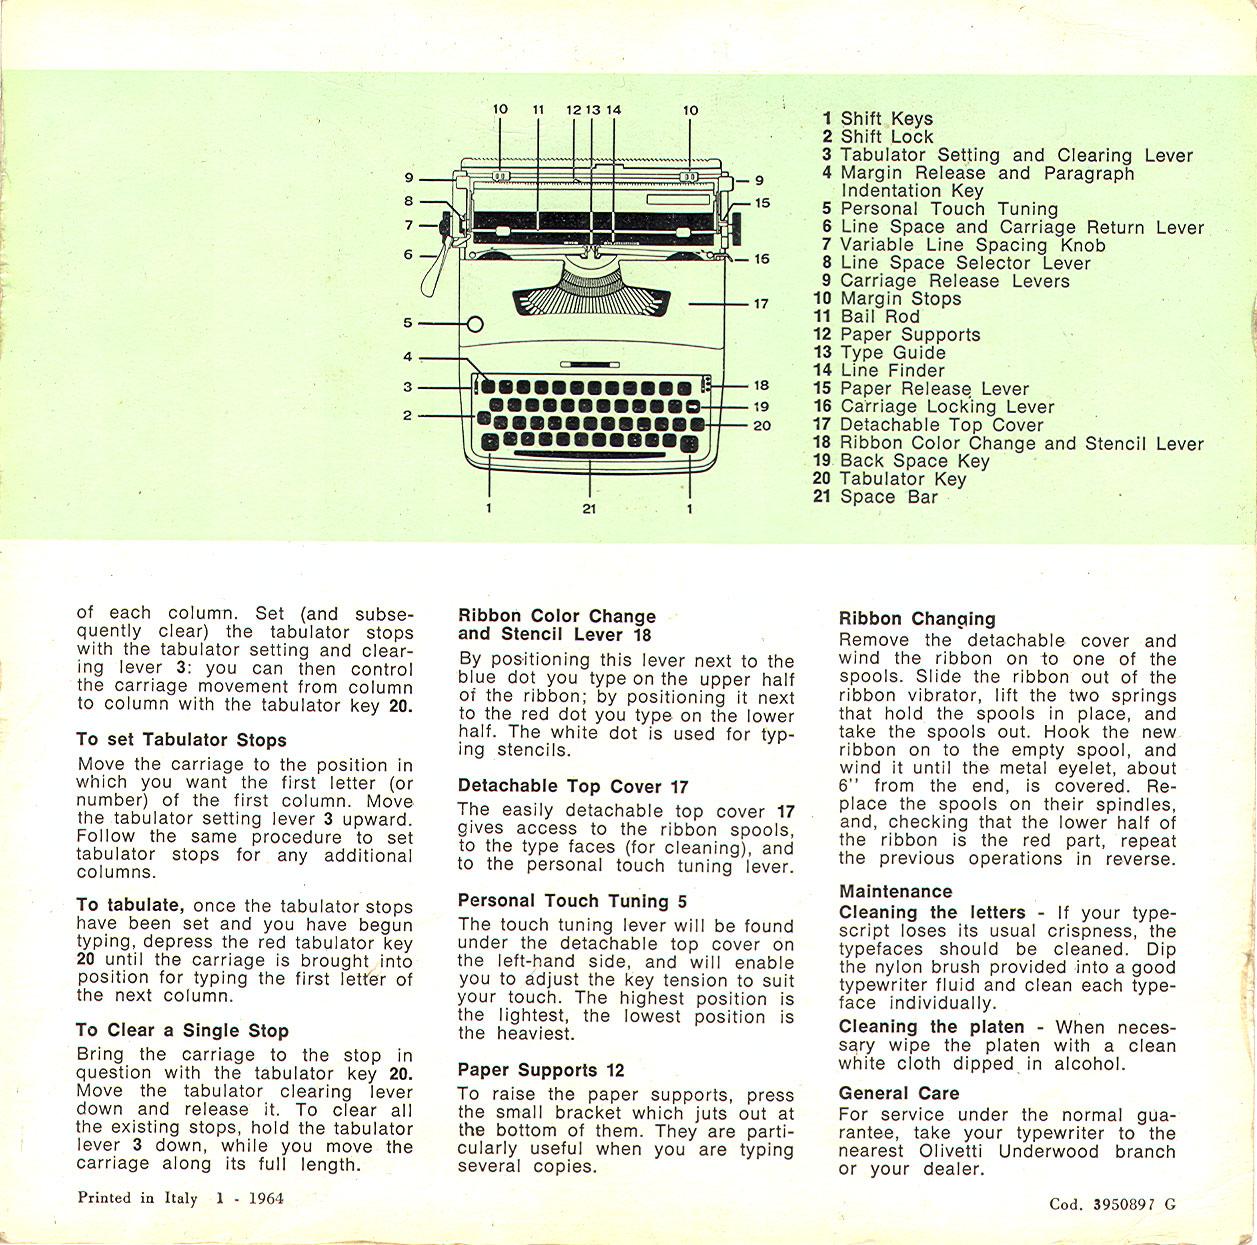 typewriter user s manual olivetti underwood lettera 32 circa 1964 rh munk org Olivetti Typewriter Ad Olivetti Calculator